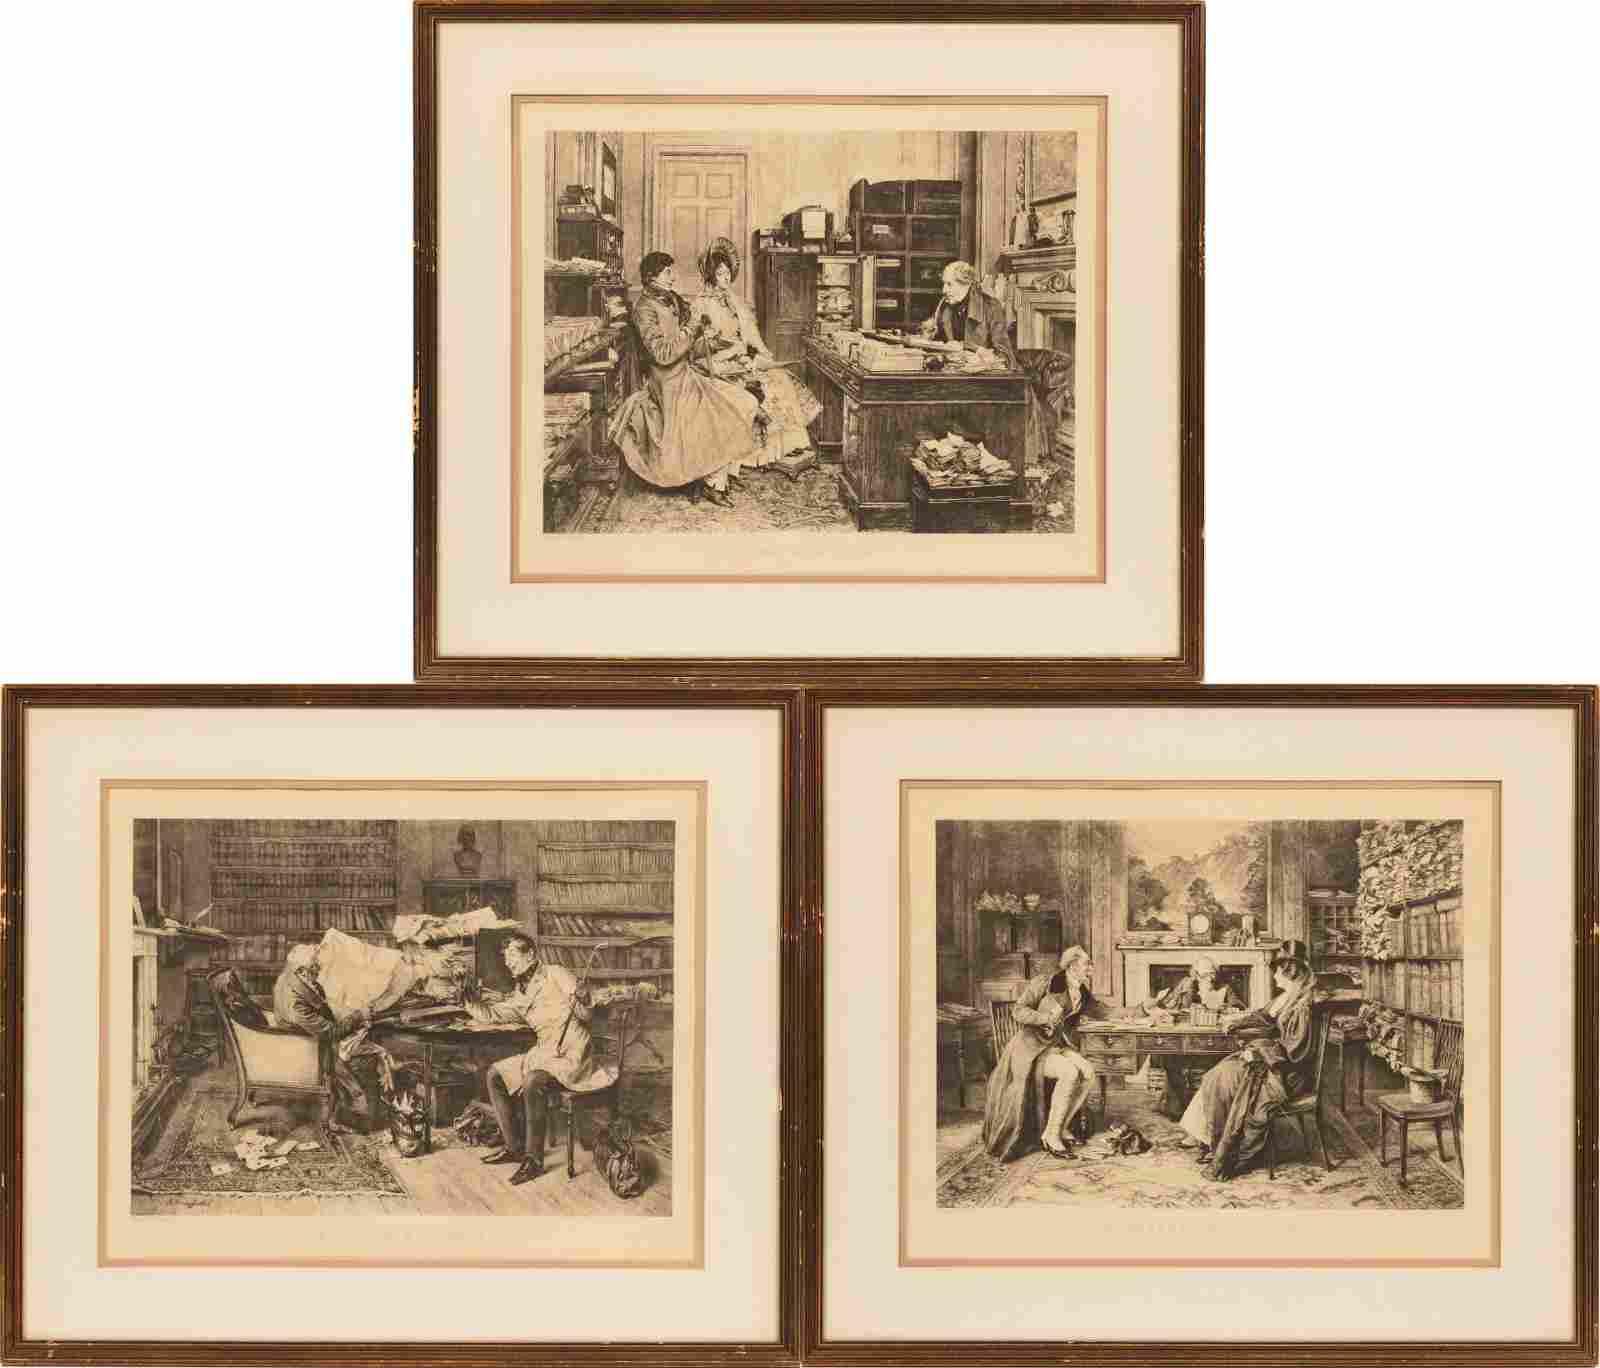 WALTER DENDY SADLER (BRITISH, 1854–1923) OFFSET